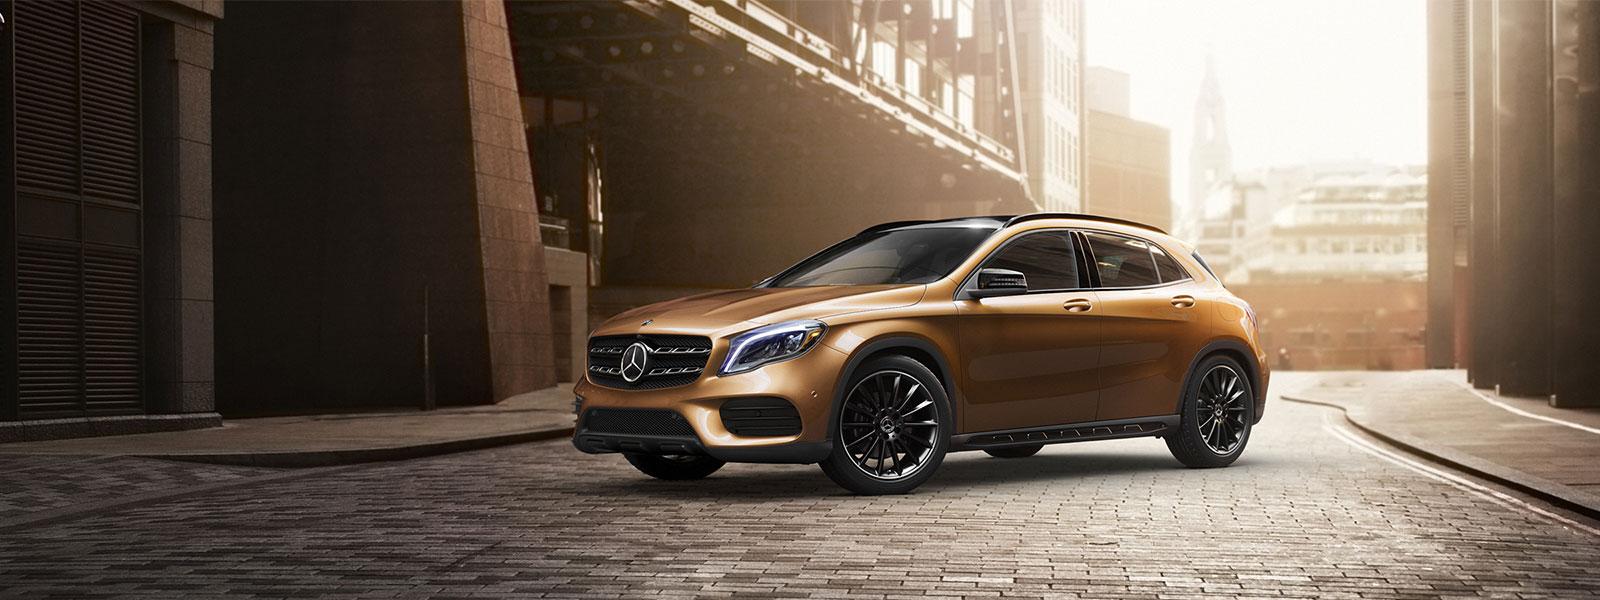 Gla Suv Mercedes Benz